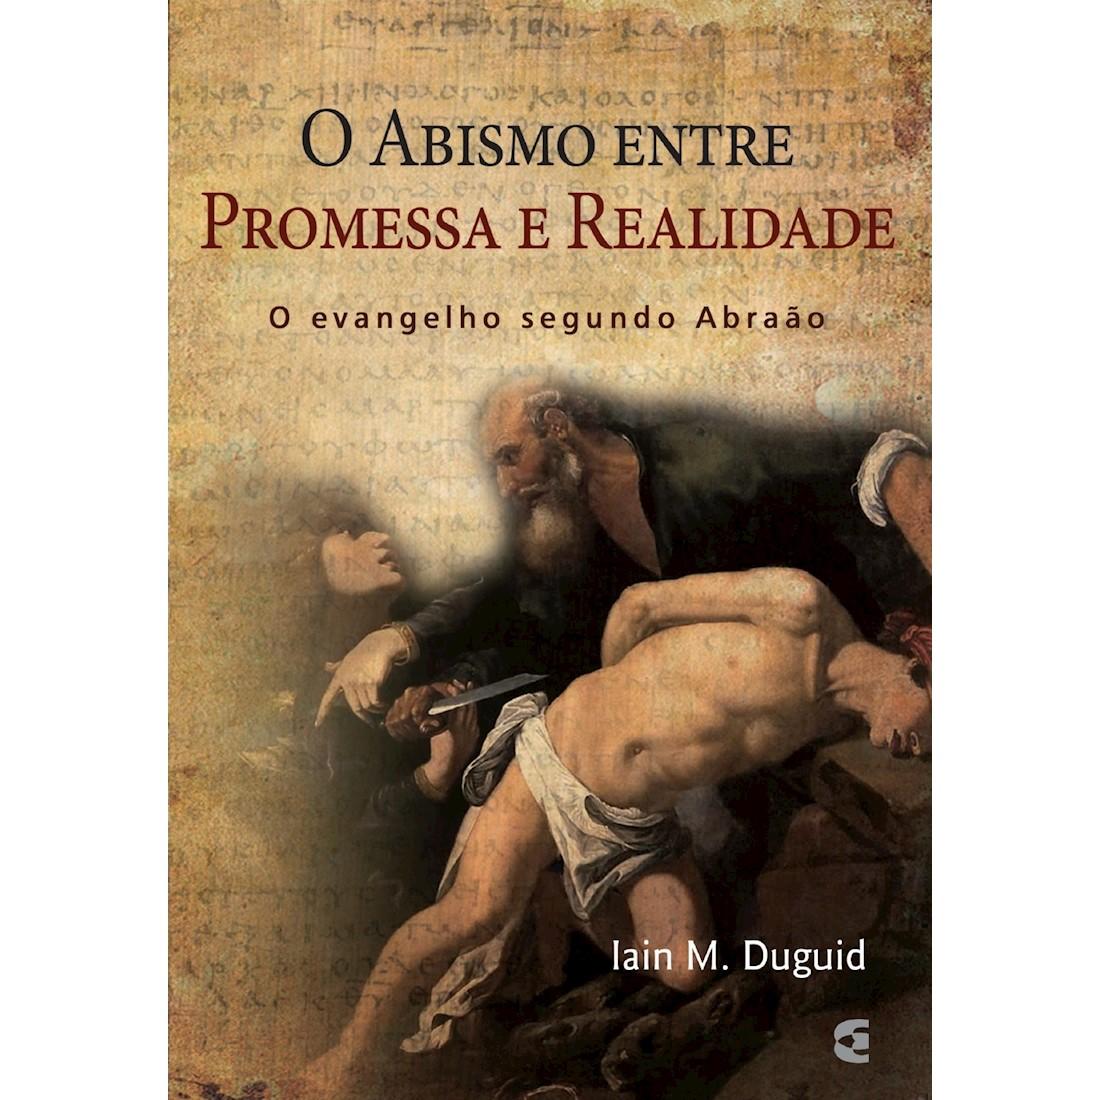 Livro Abismo Entre Promessas e Realidade